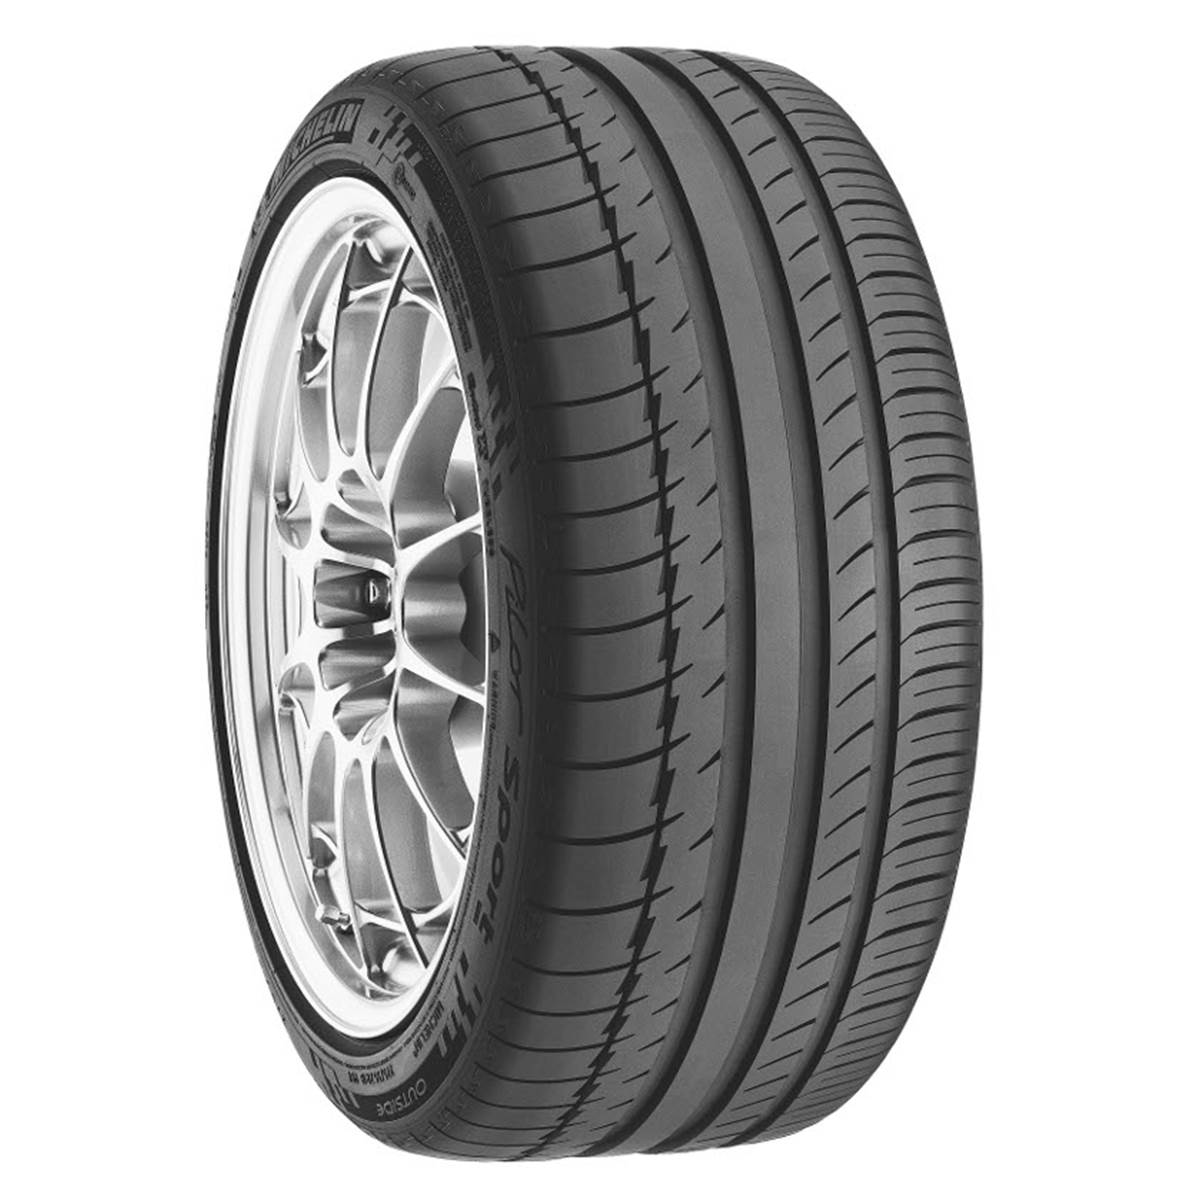 Pneu Michelin 225/45R17 94Y Pilot Sport Ps2 XL